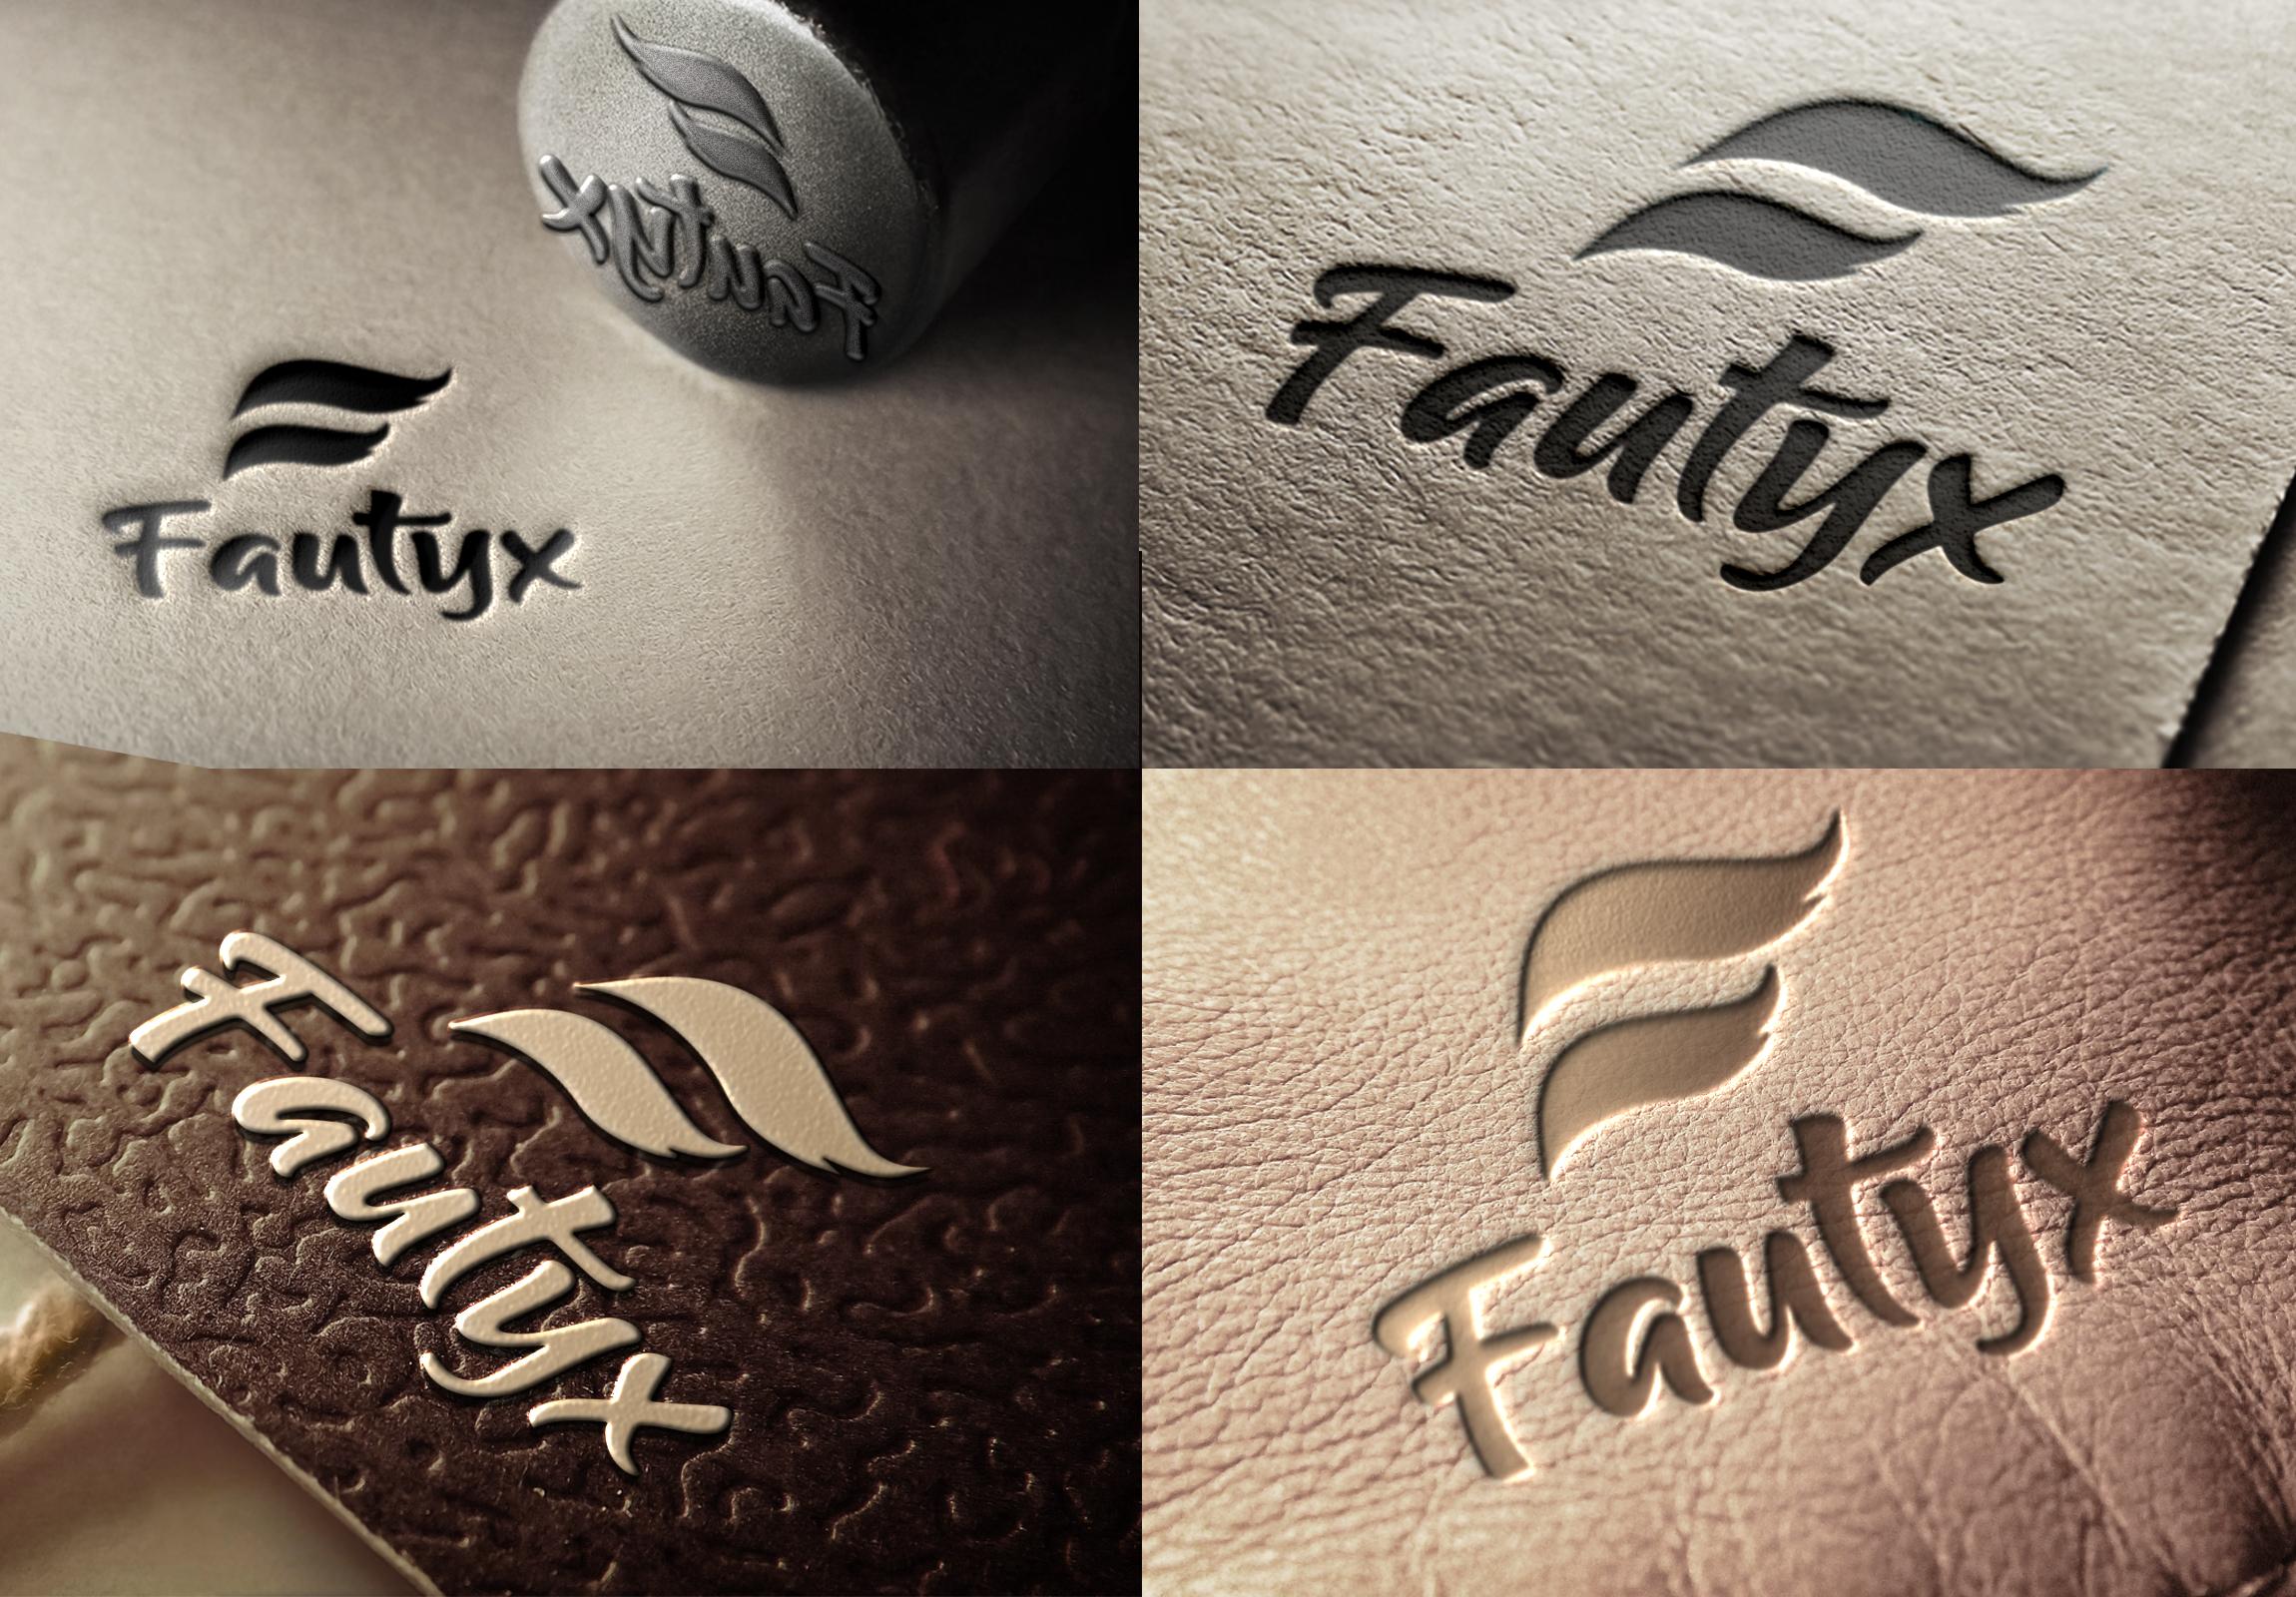 Iwill create an epic Photorealistic 3d logo mockups